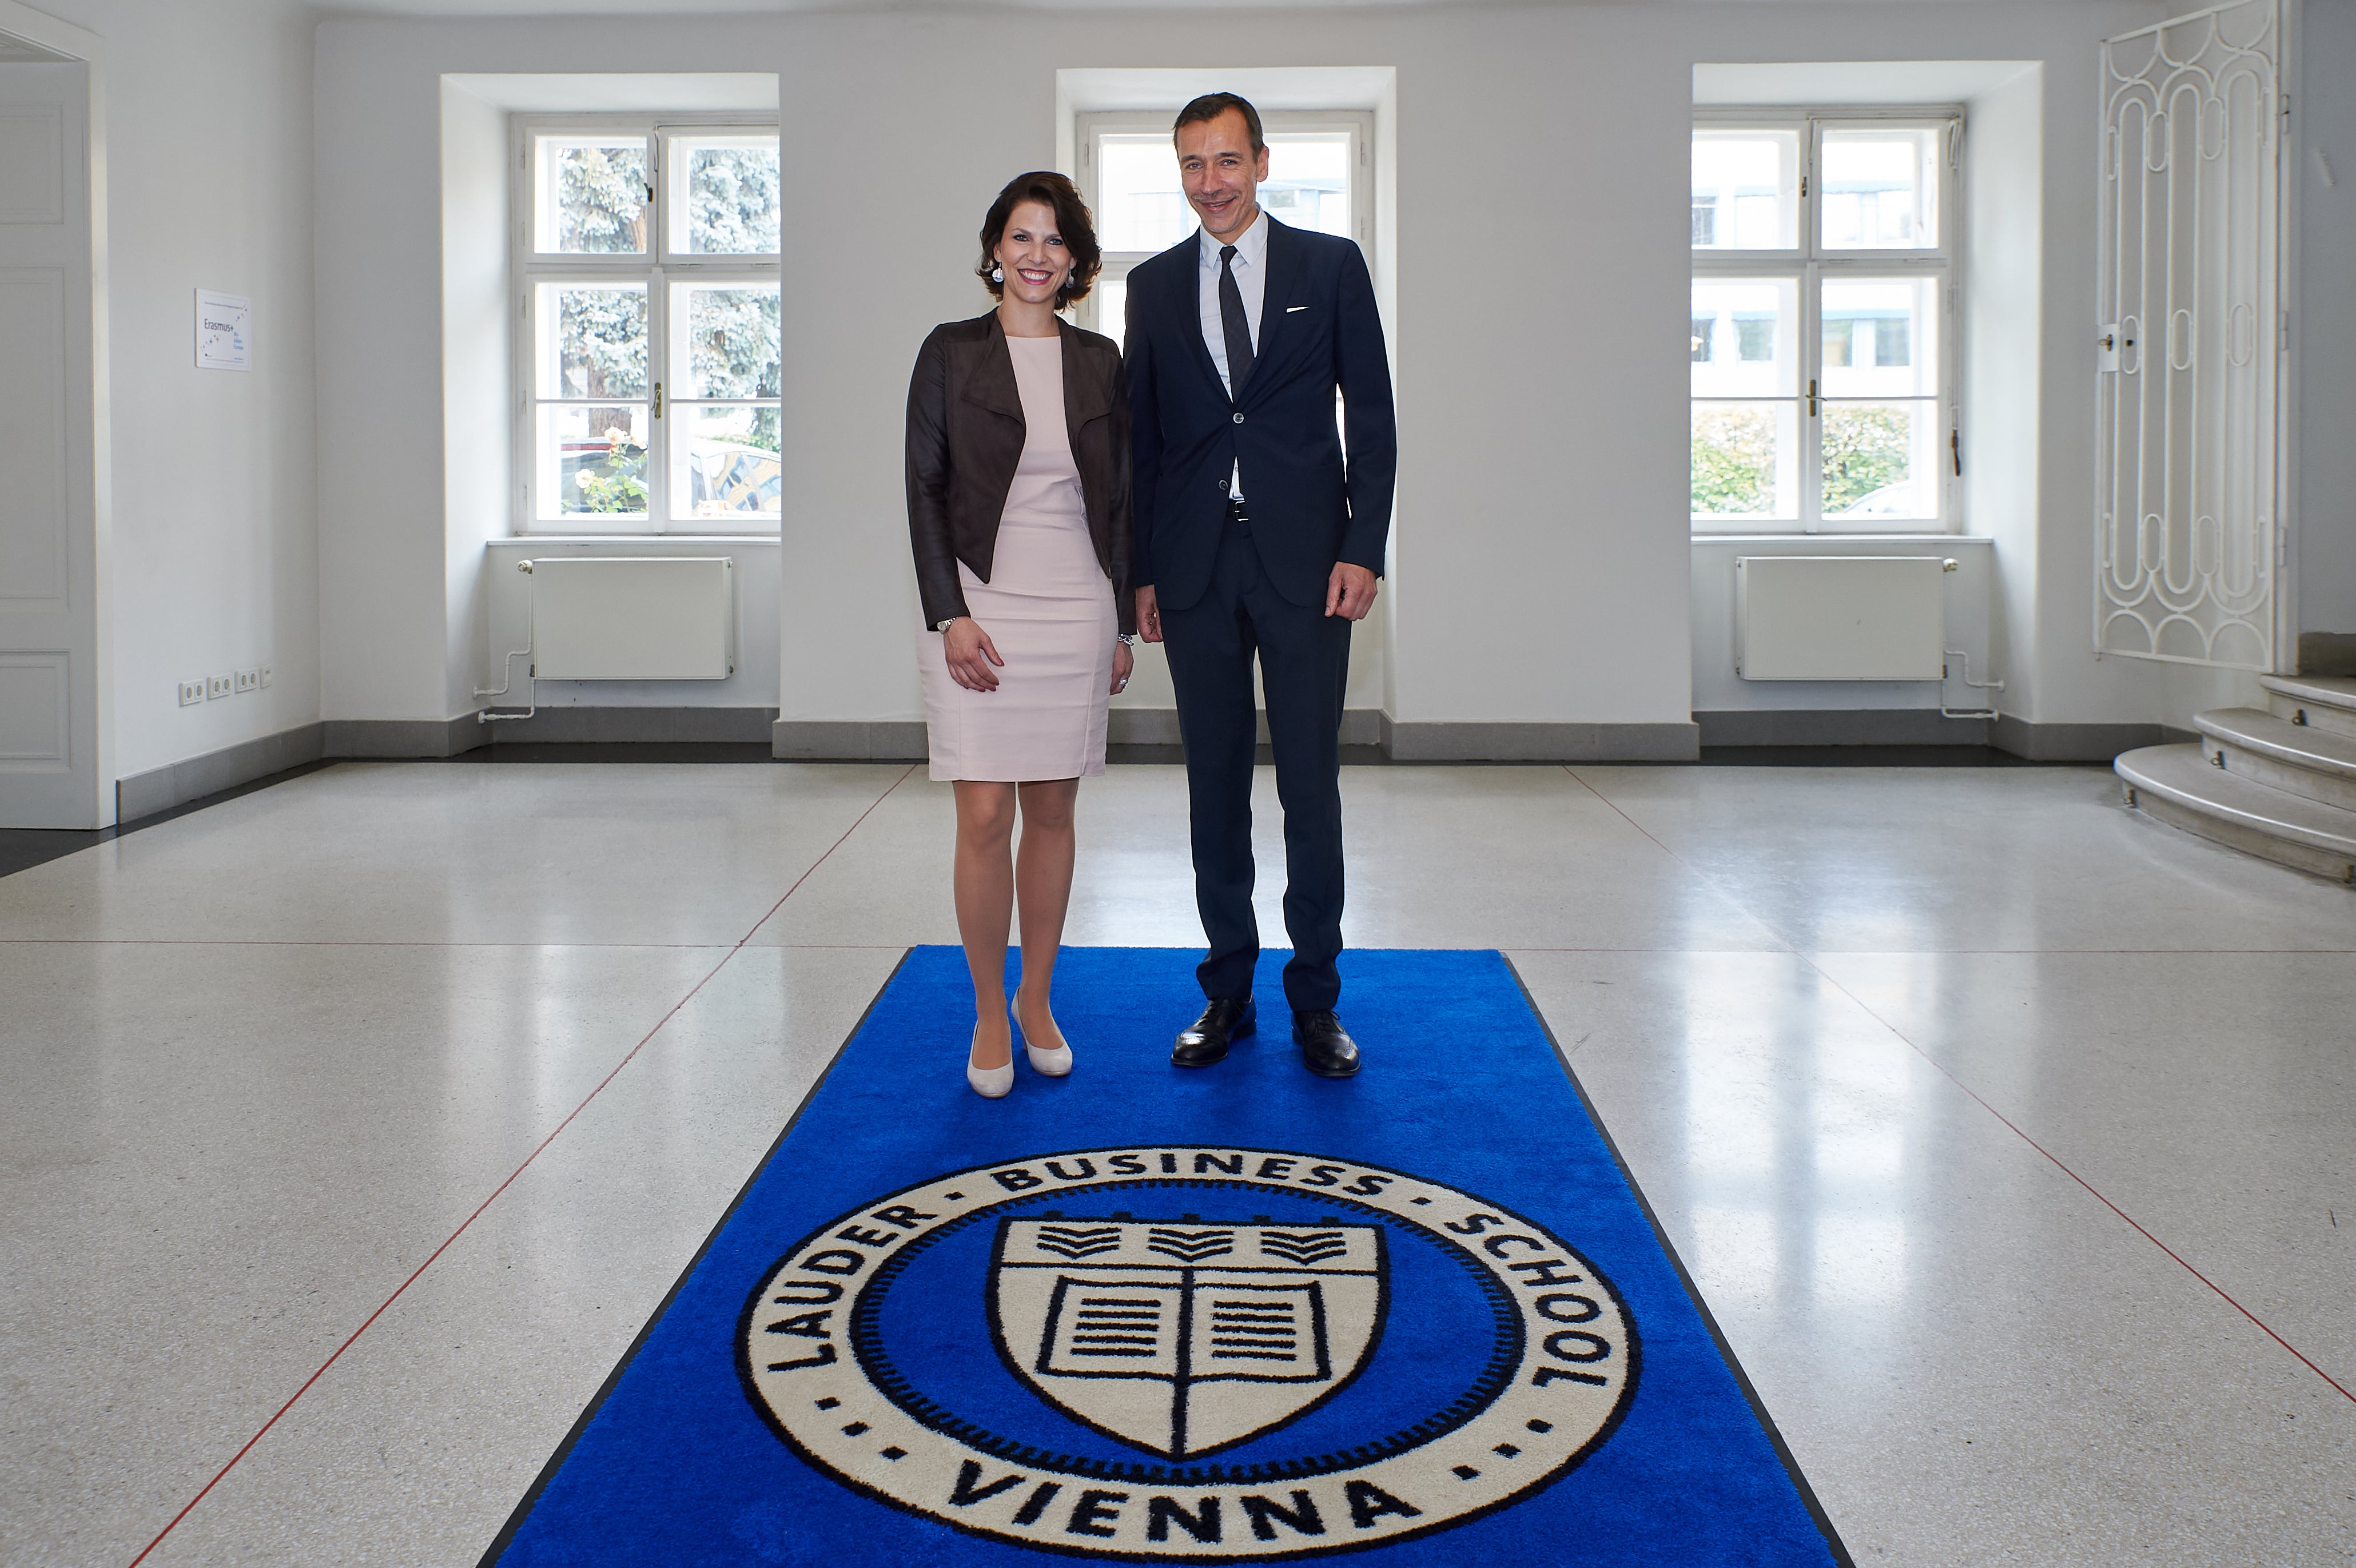 State Secretary & Alexander Zirkler